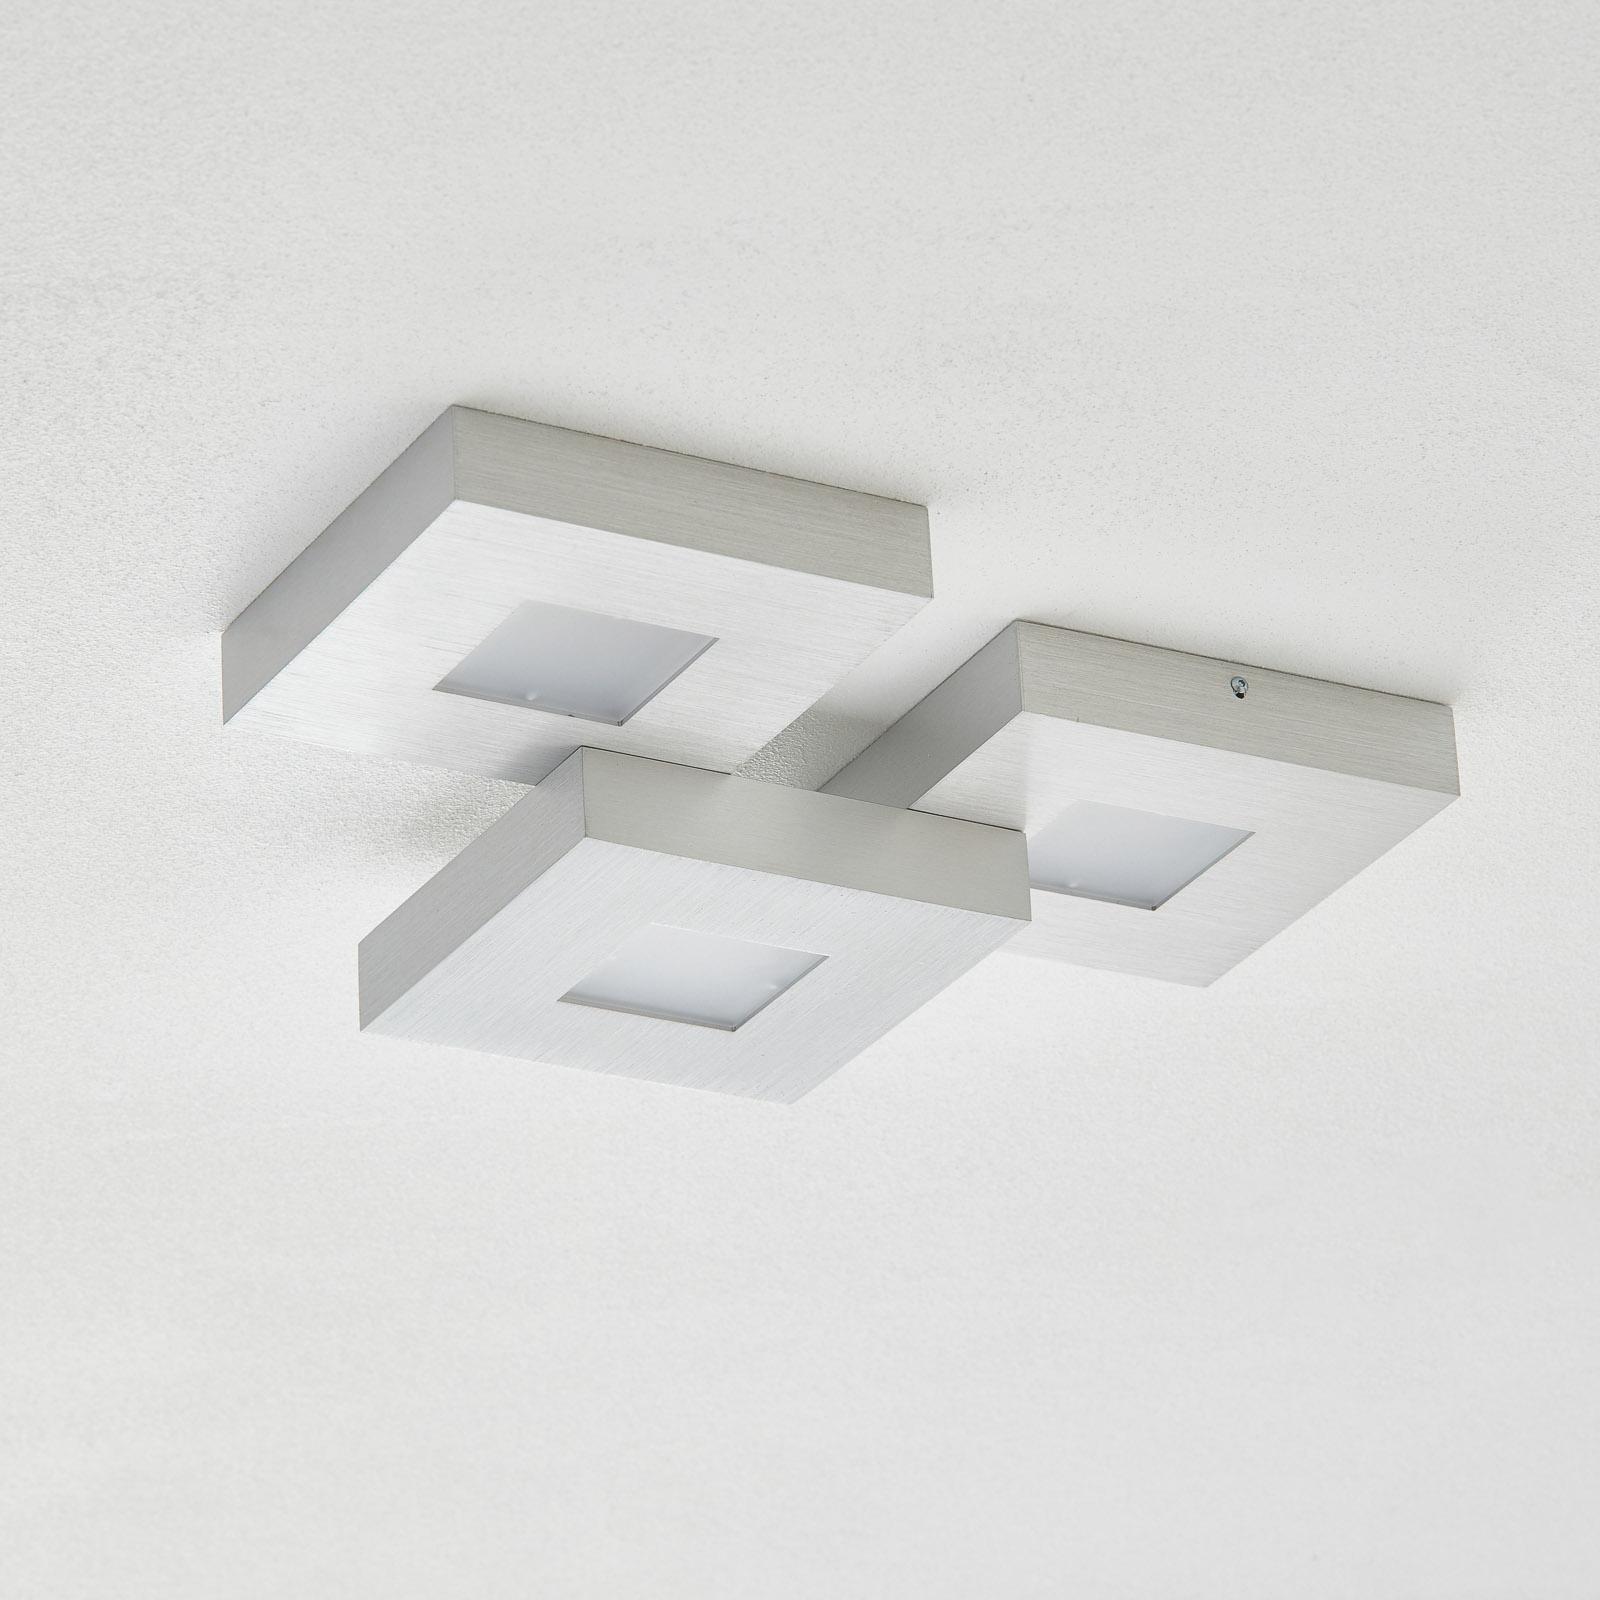 Cubus LED-taklampe med 3 lys